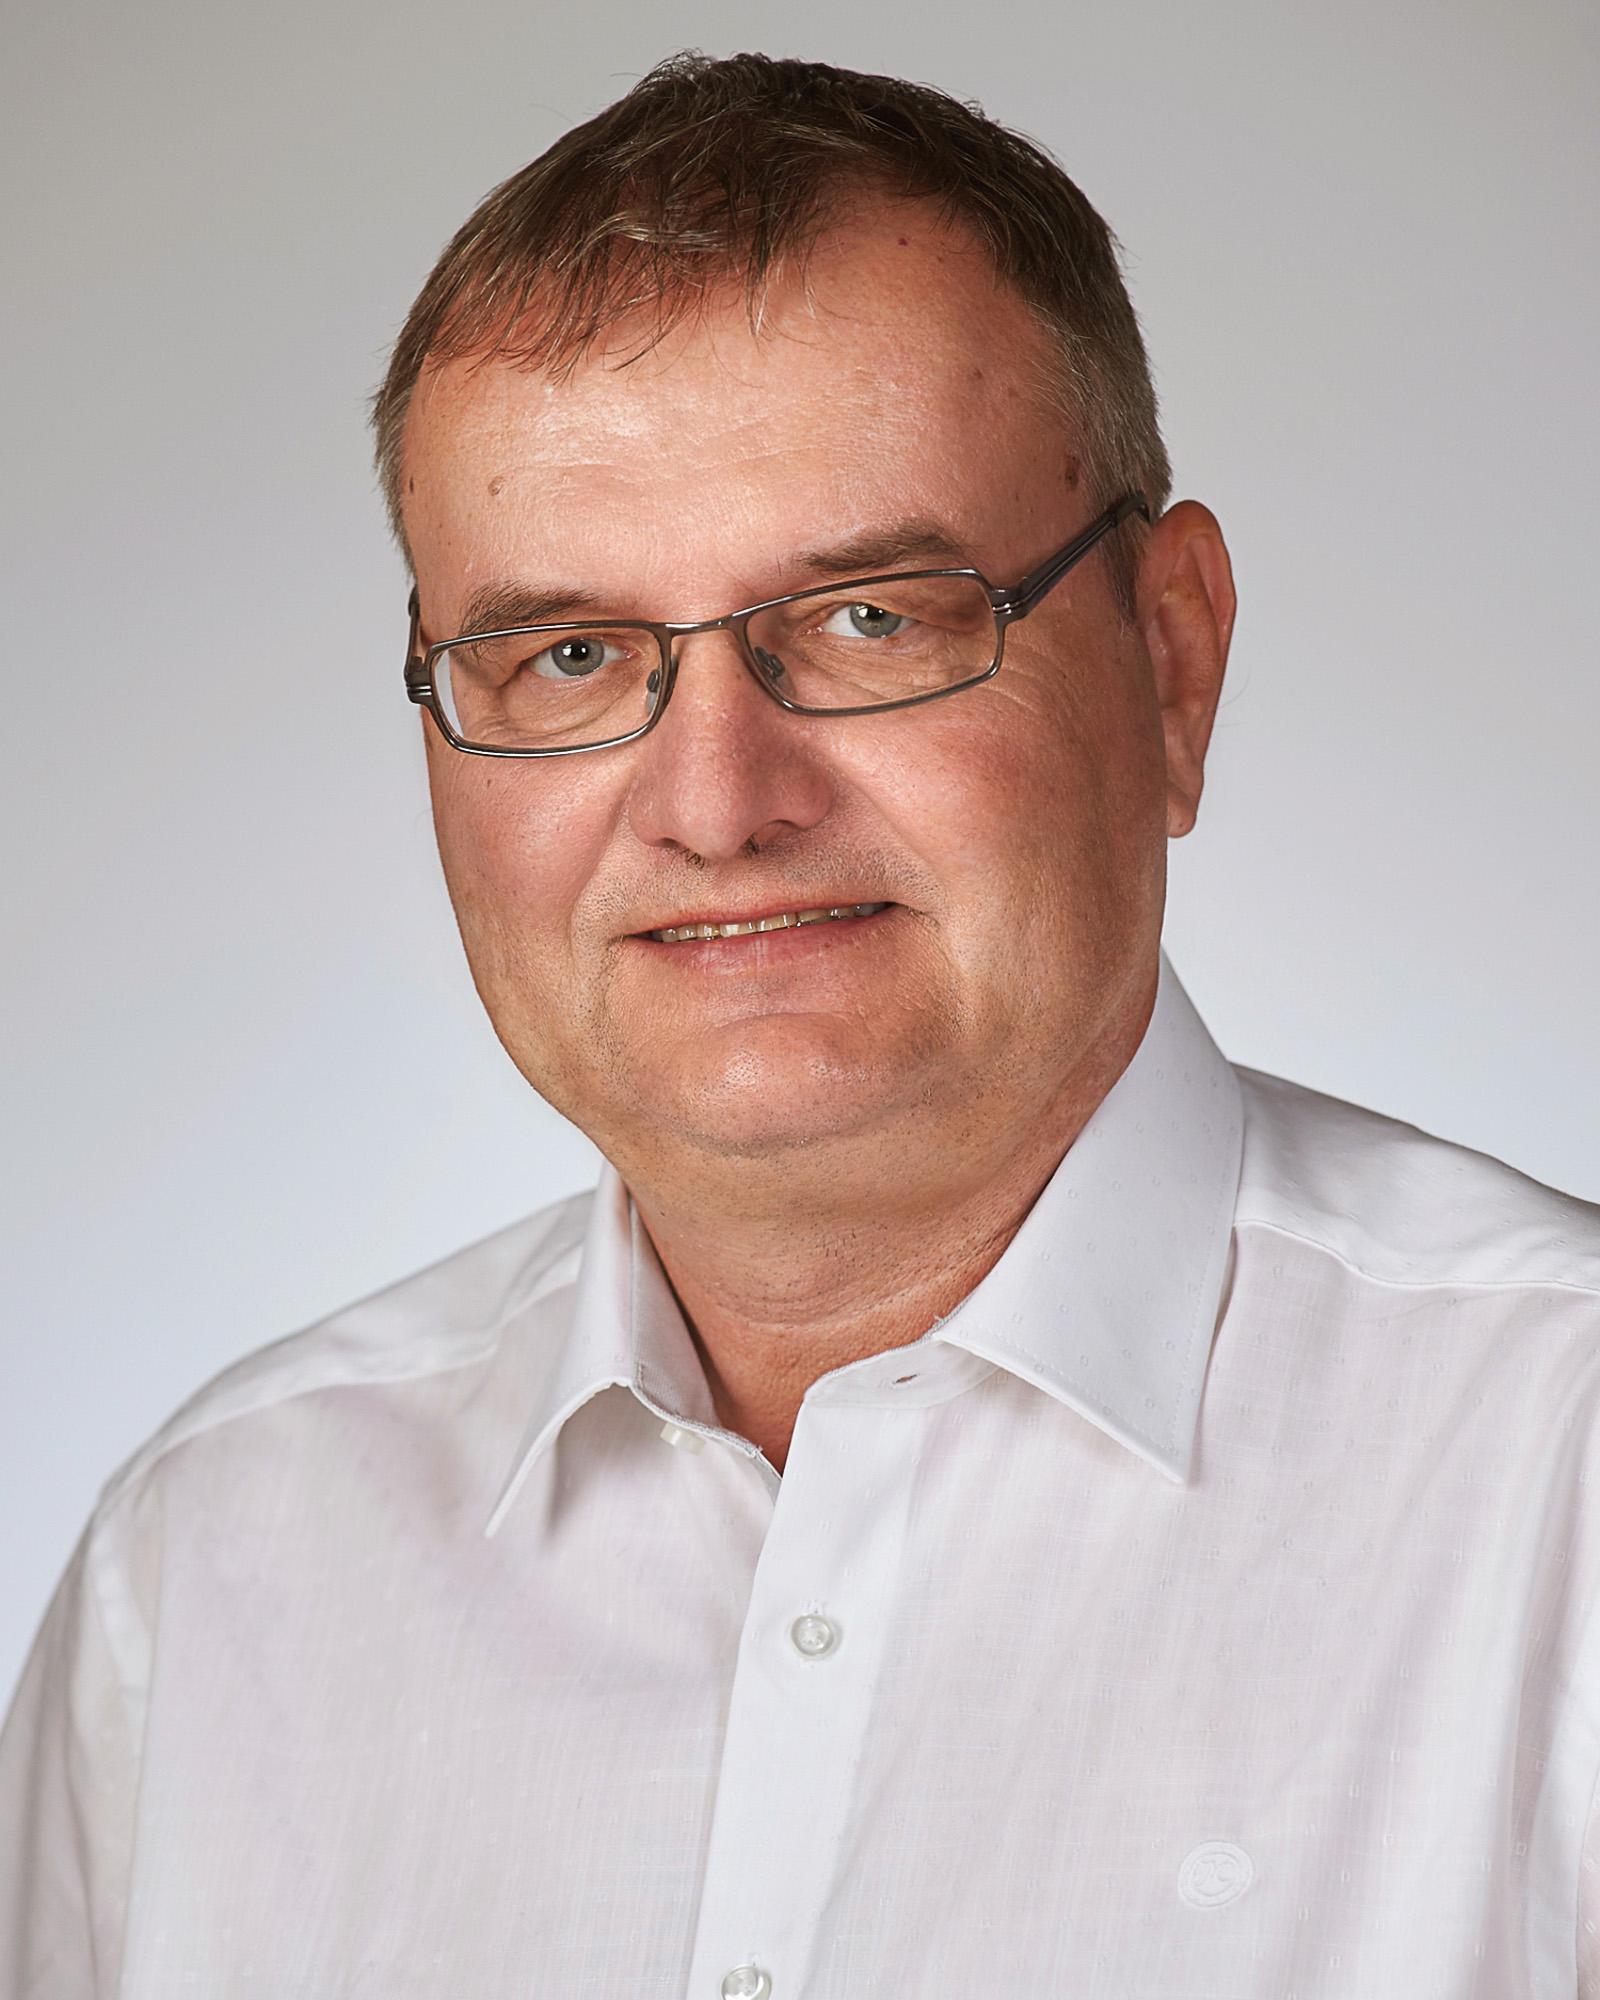 Martin Prusák